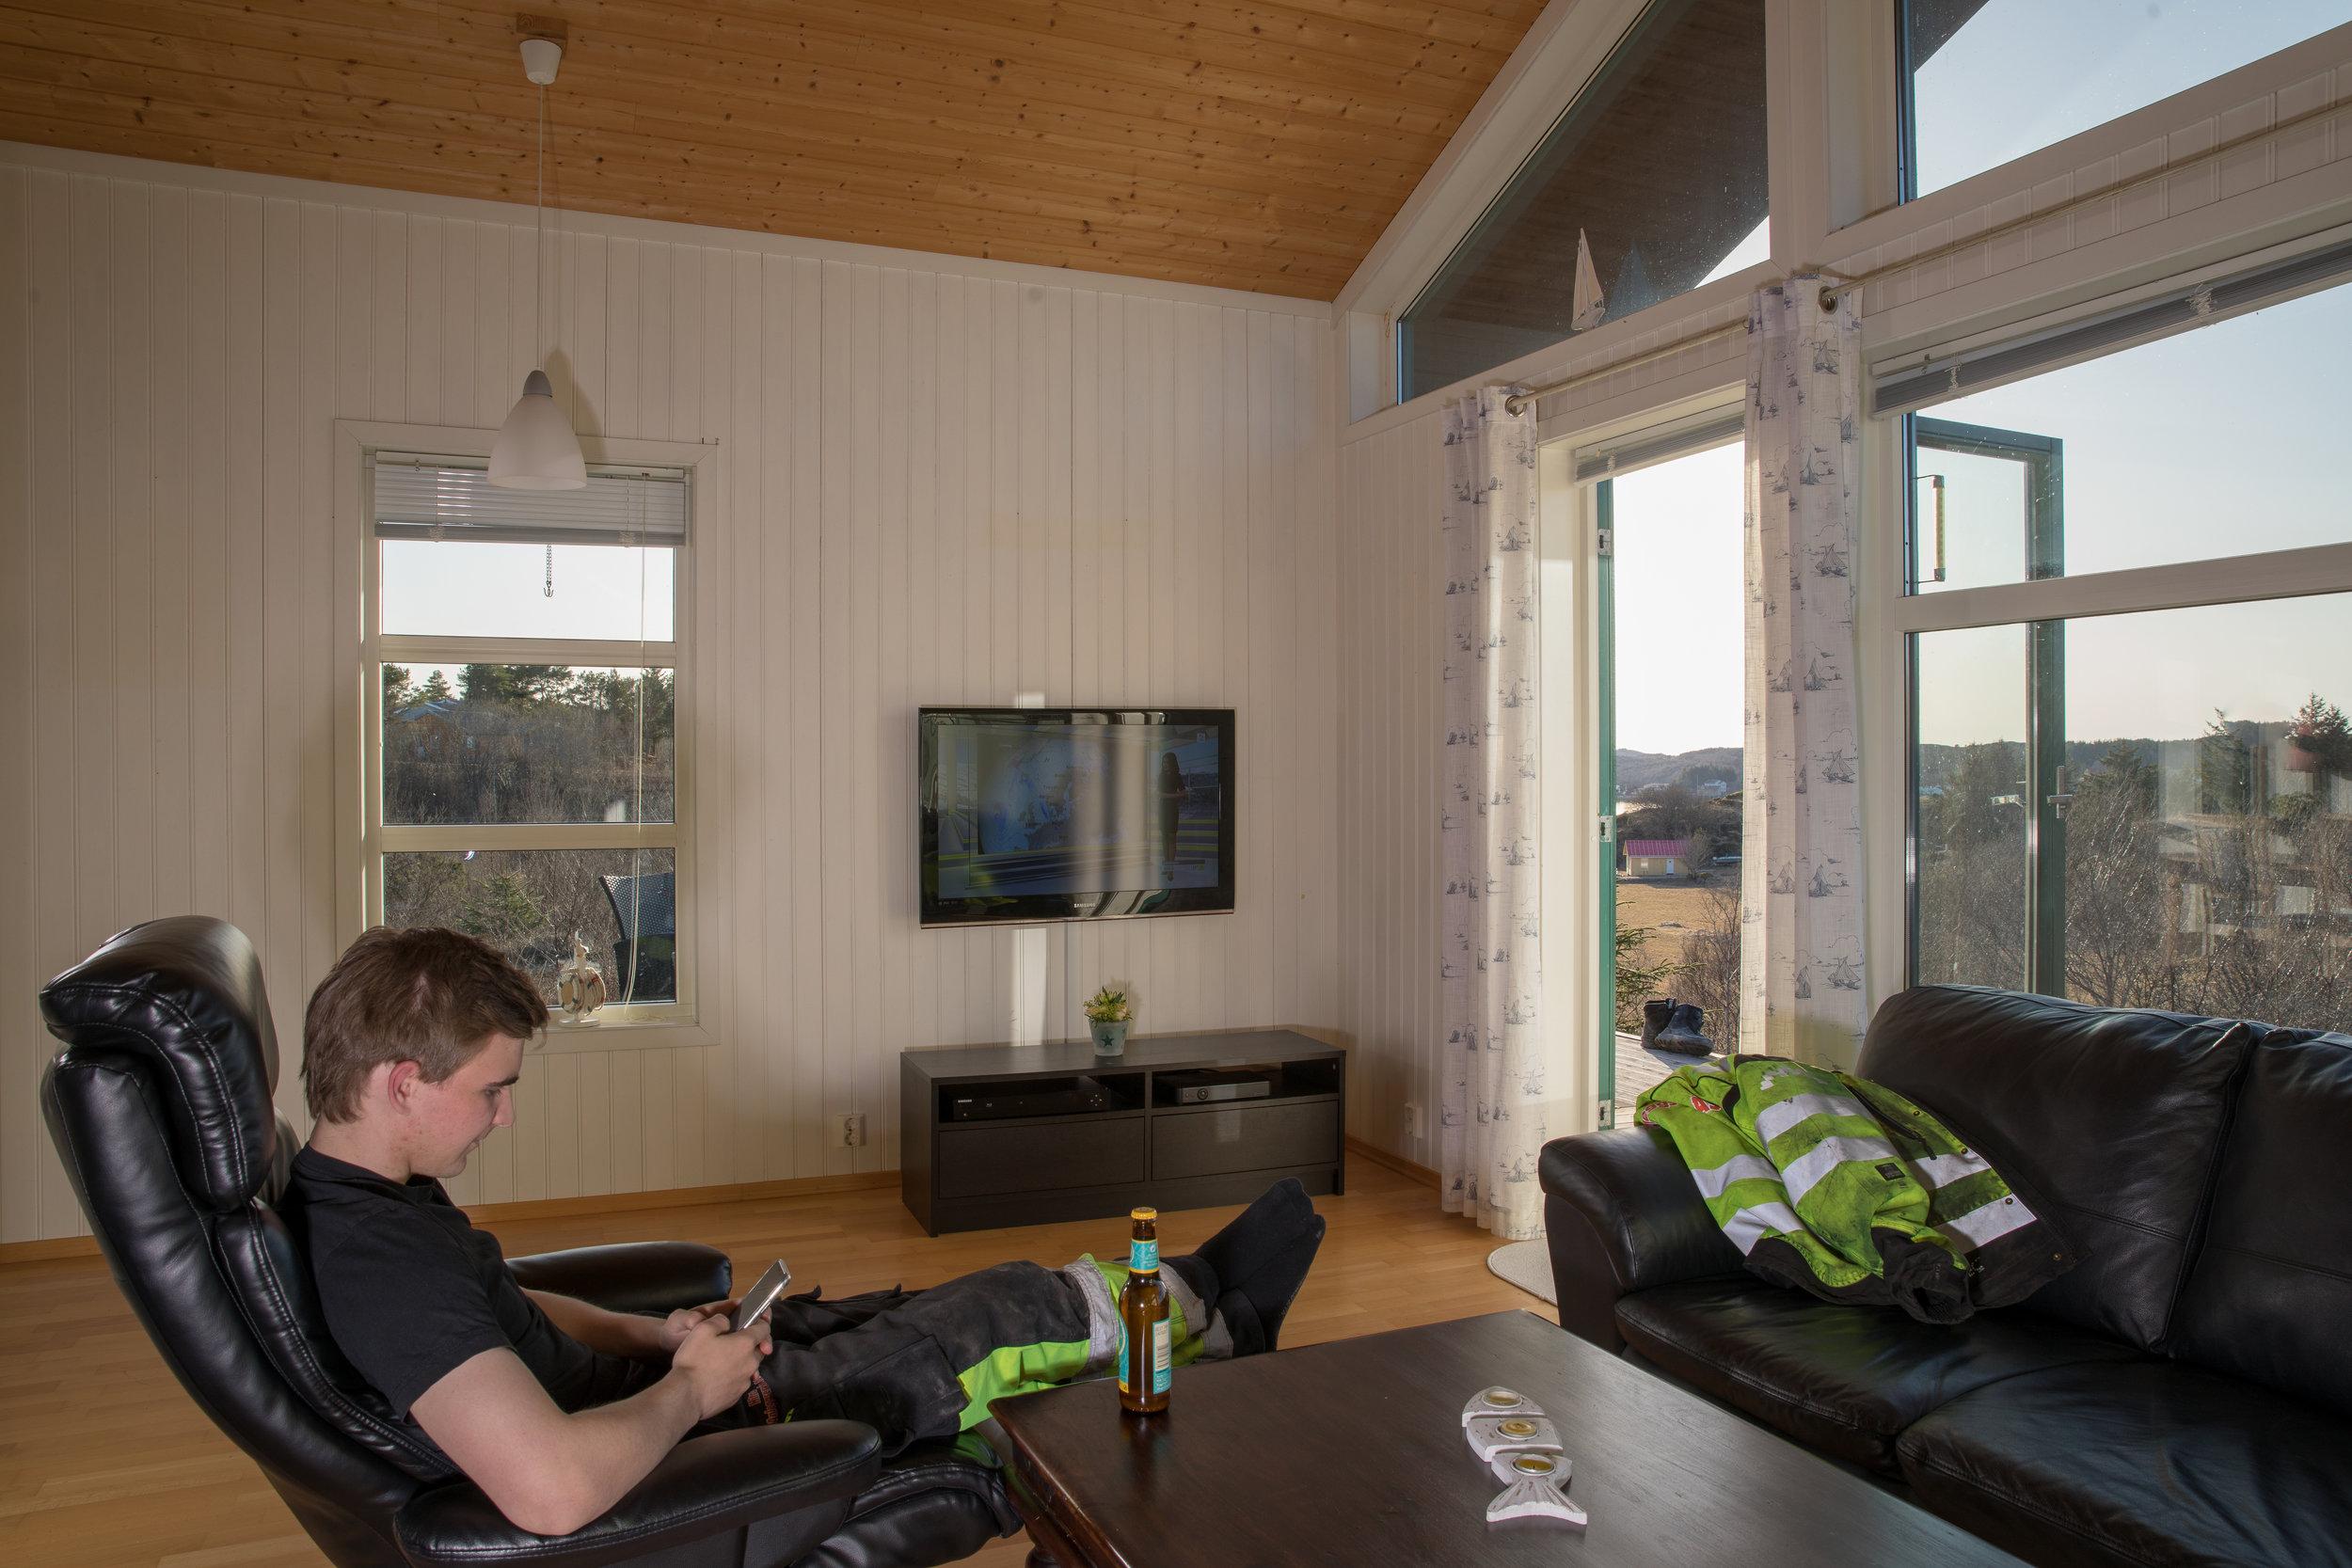 Dolmsundet-hotell-Hitra-Norge-norway-fotoknoff-sven-erik-knoff-high-res--0771.jpg